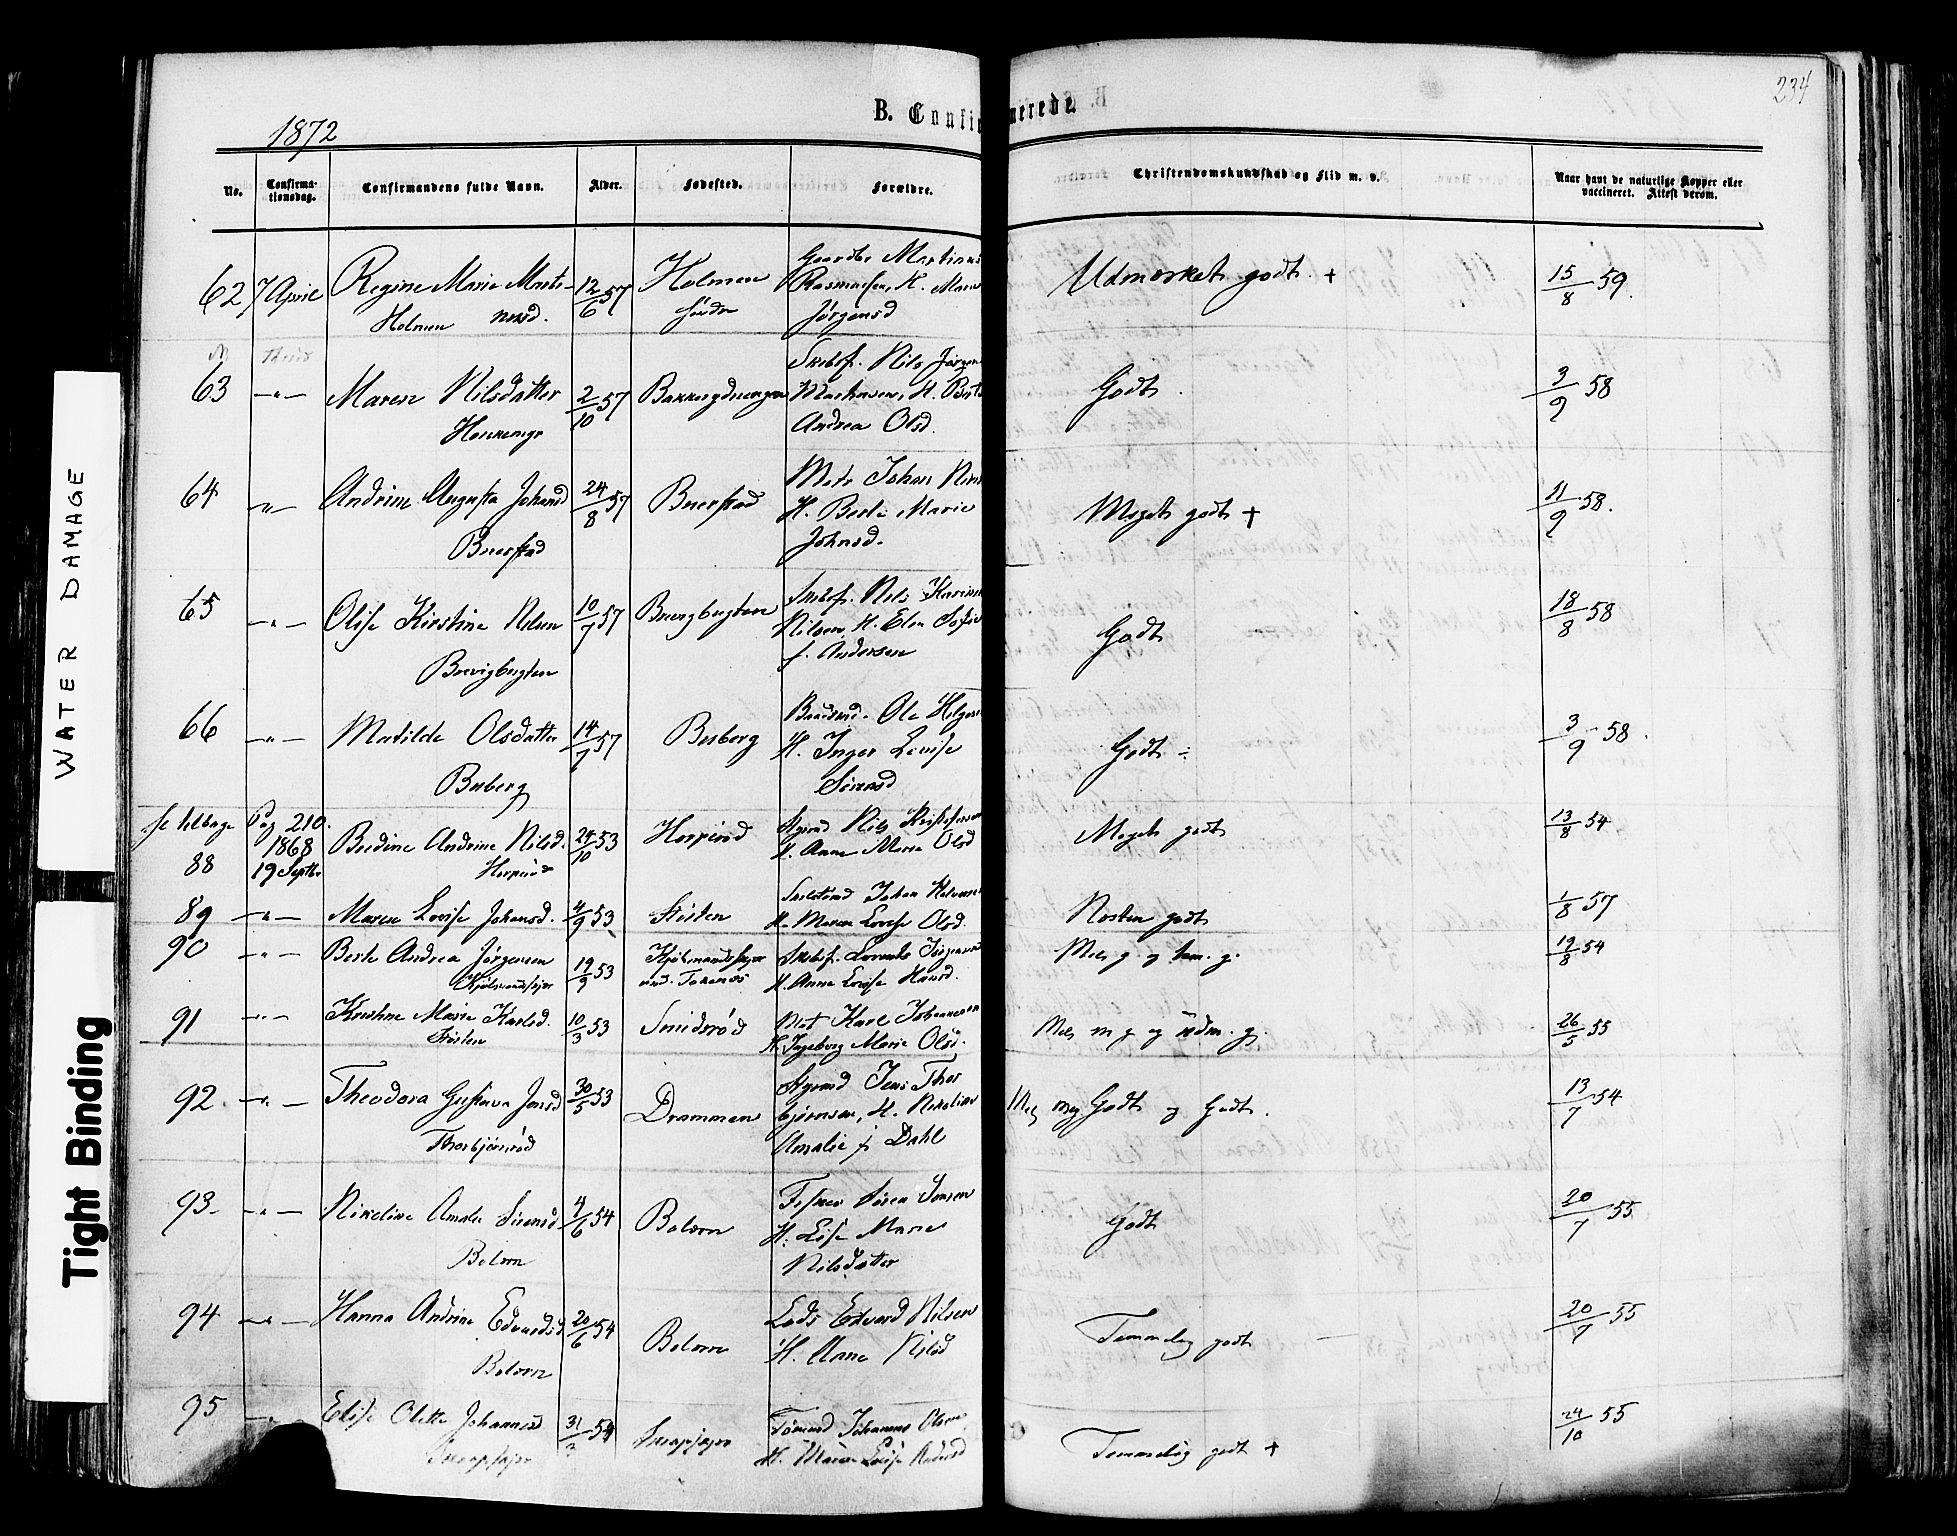 SAKO, Nøtterøy kirkebøker, F/Fa/L0007: Ministerialbok nr. I 7, 1865-1877, s. 234